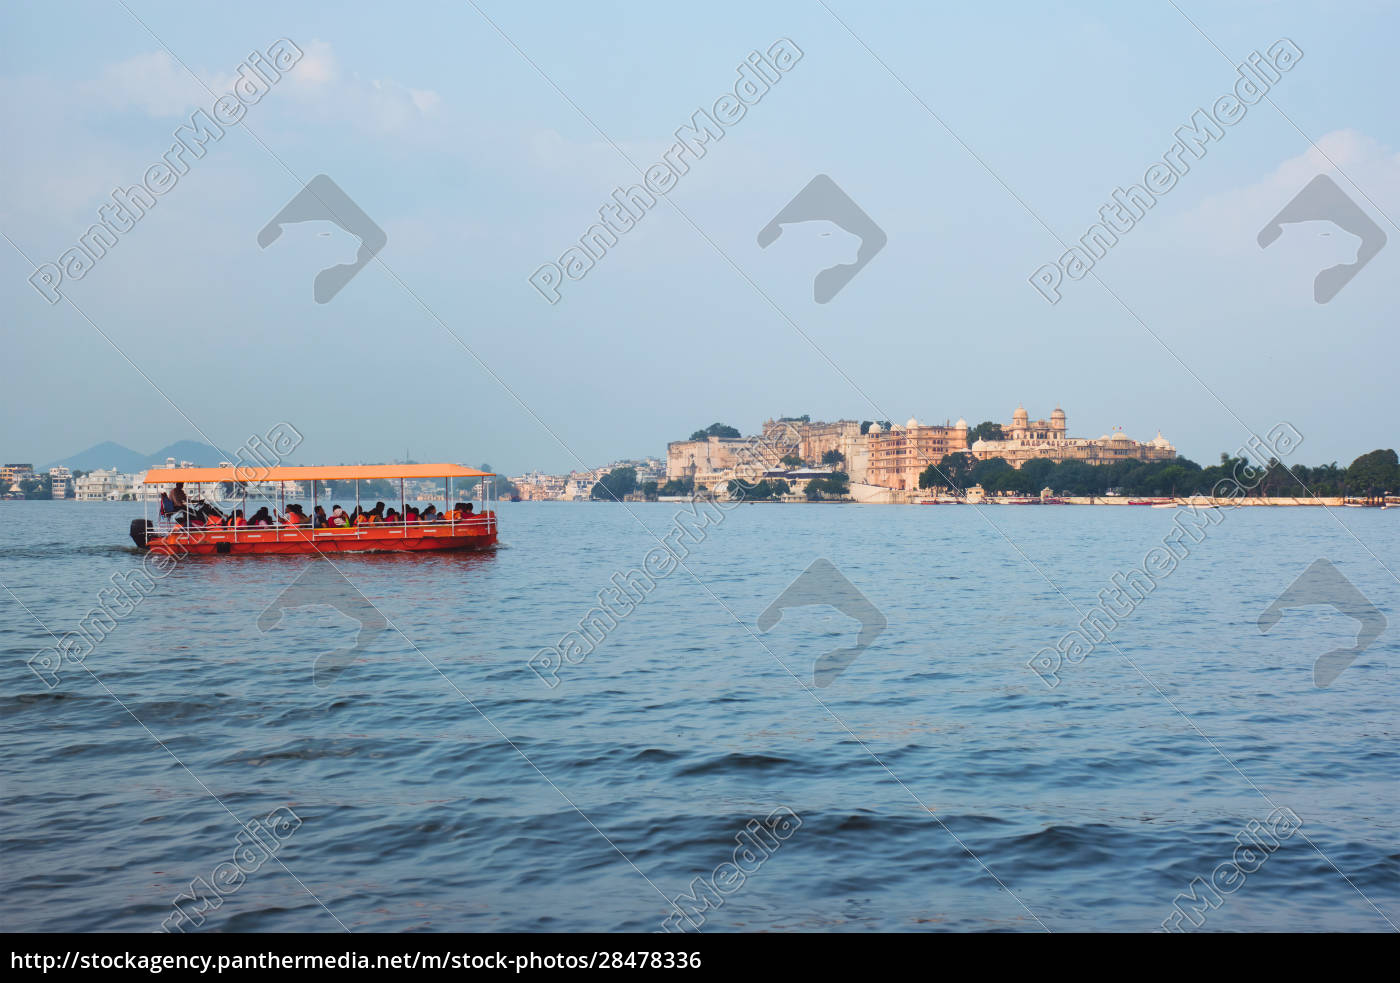 toruist, boat, on, lake, pichola, with - 28478336